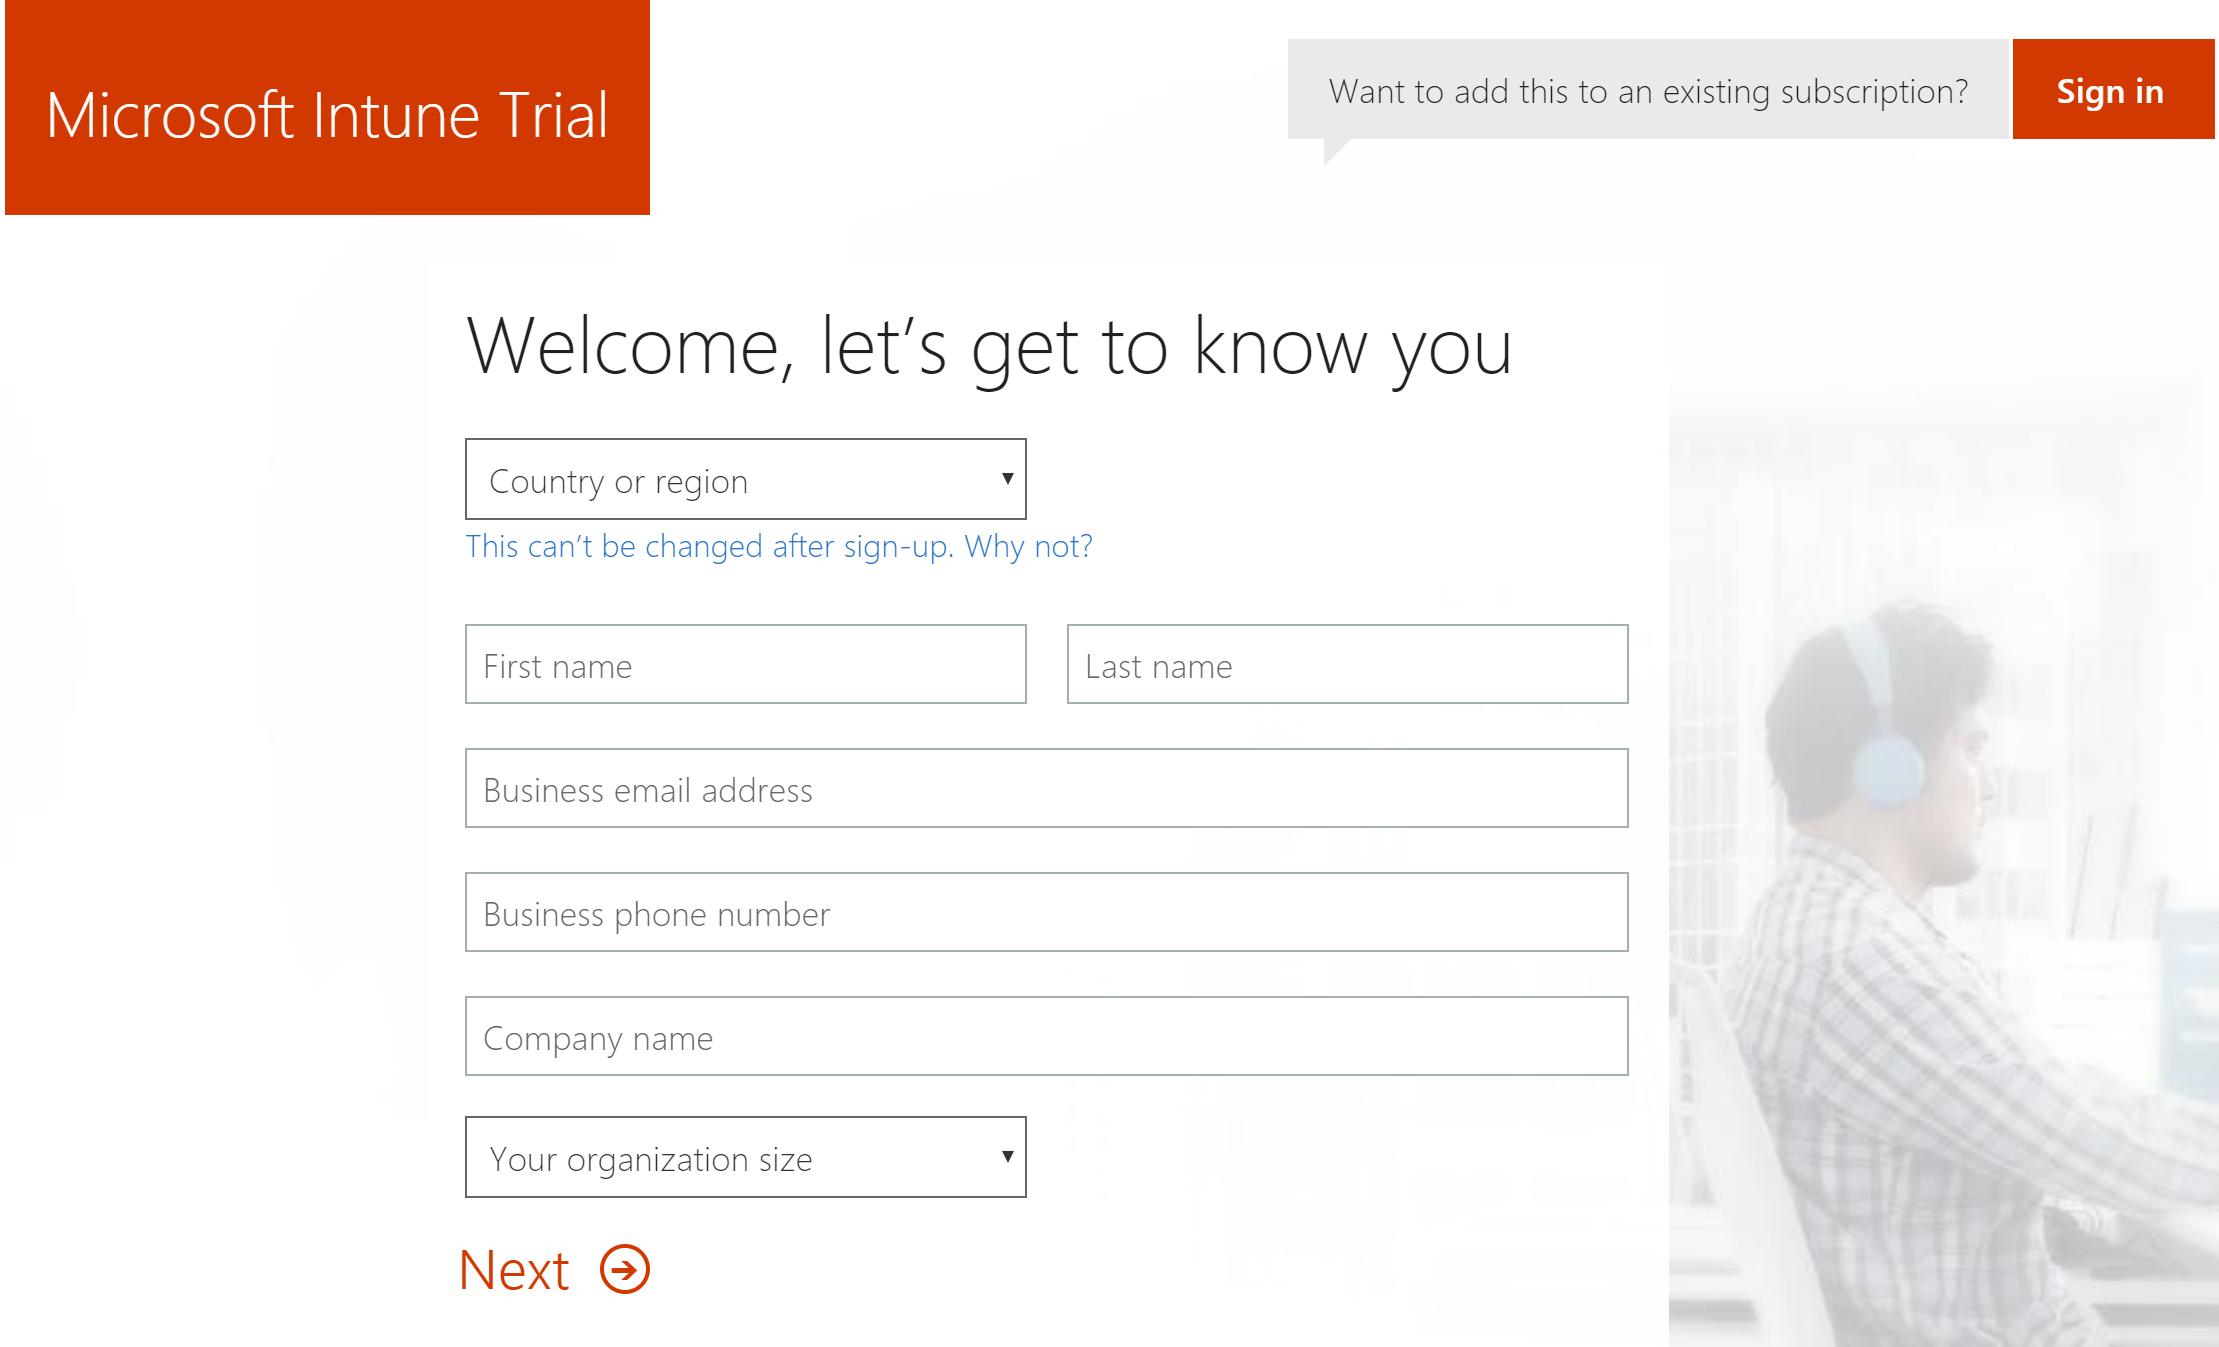 Microsoft Intune 試用帳戶註冊網頁的螢幕擷取畫面